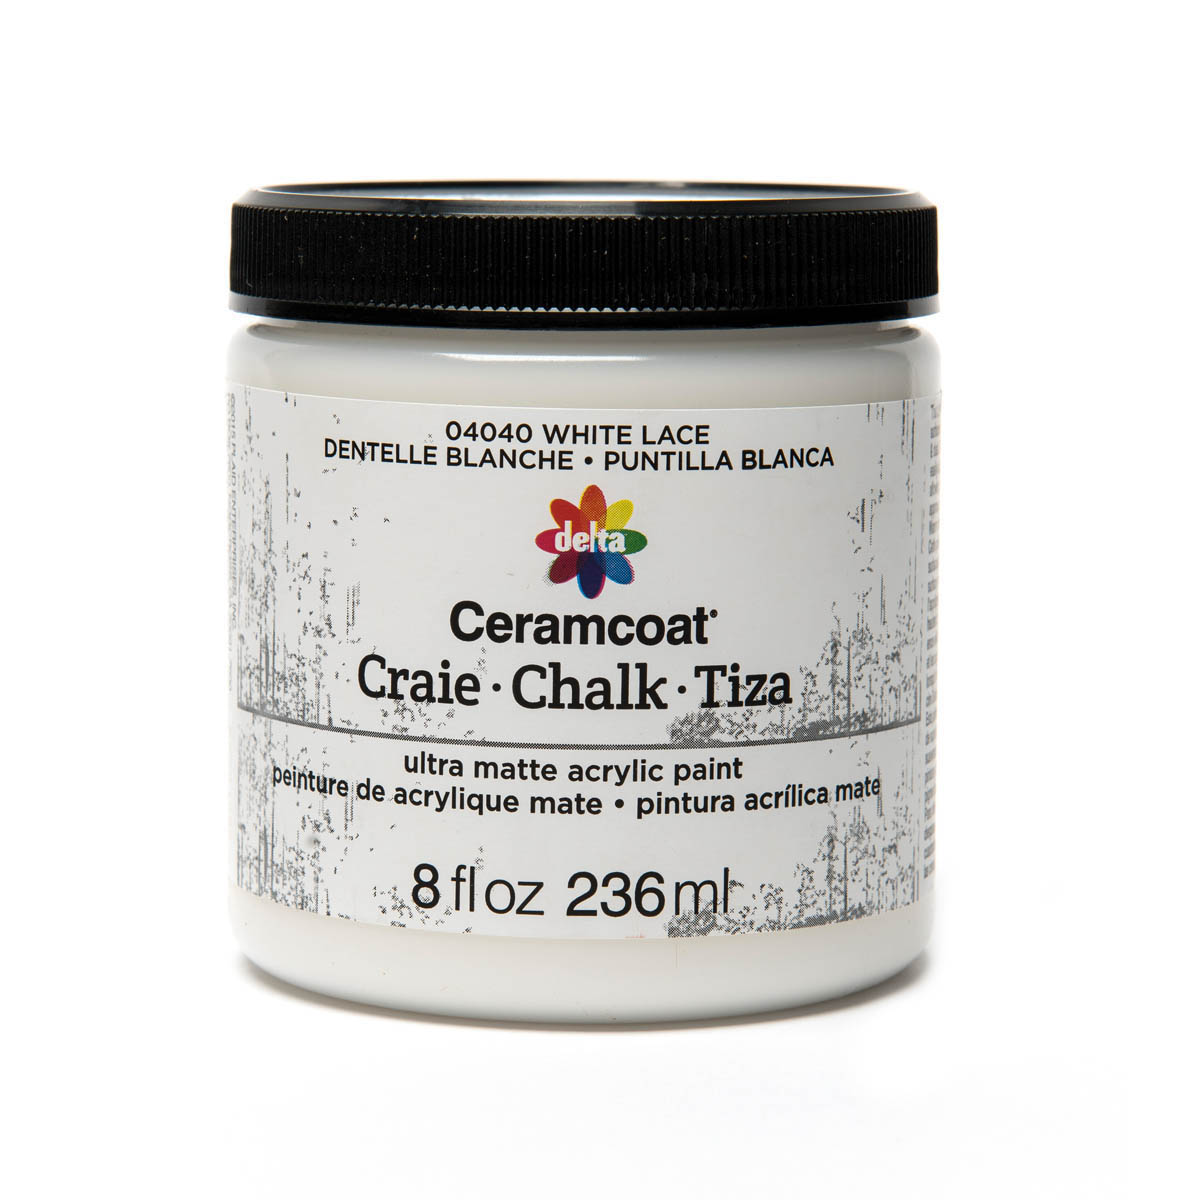 Delta Ceramcoat ® Chalk - White Lace, 8 oz. - 04040